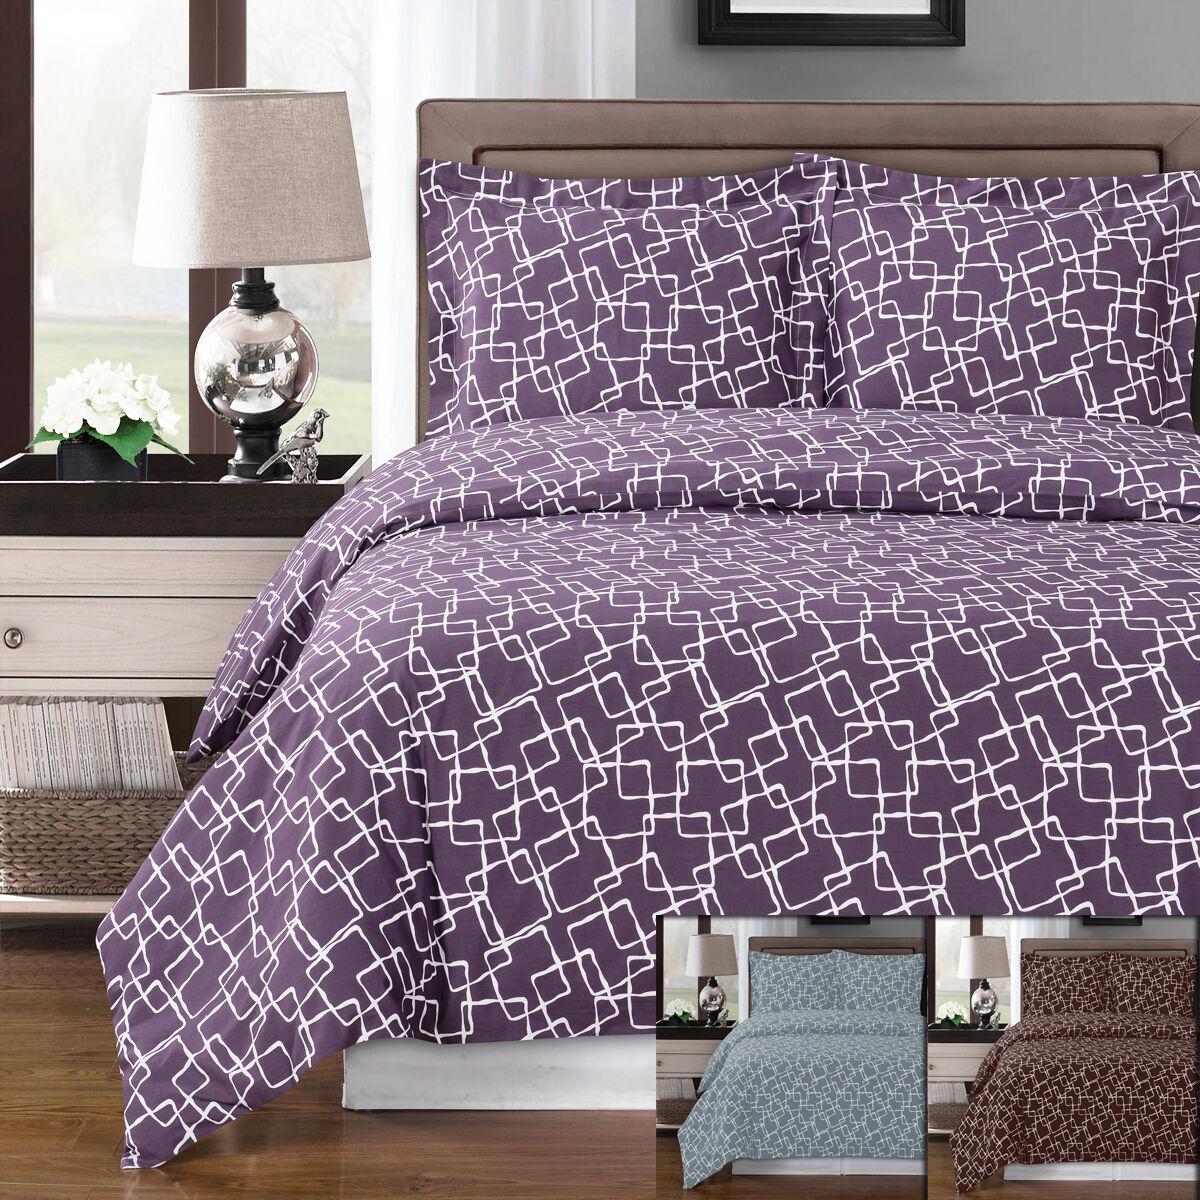 Geometric Pattern Eva 3pc Duvet Cover Set 100% Combed Cotton 300 Thread Count